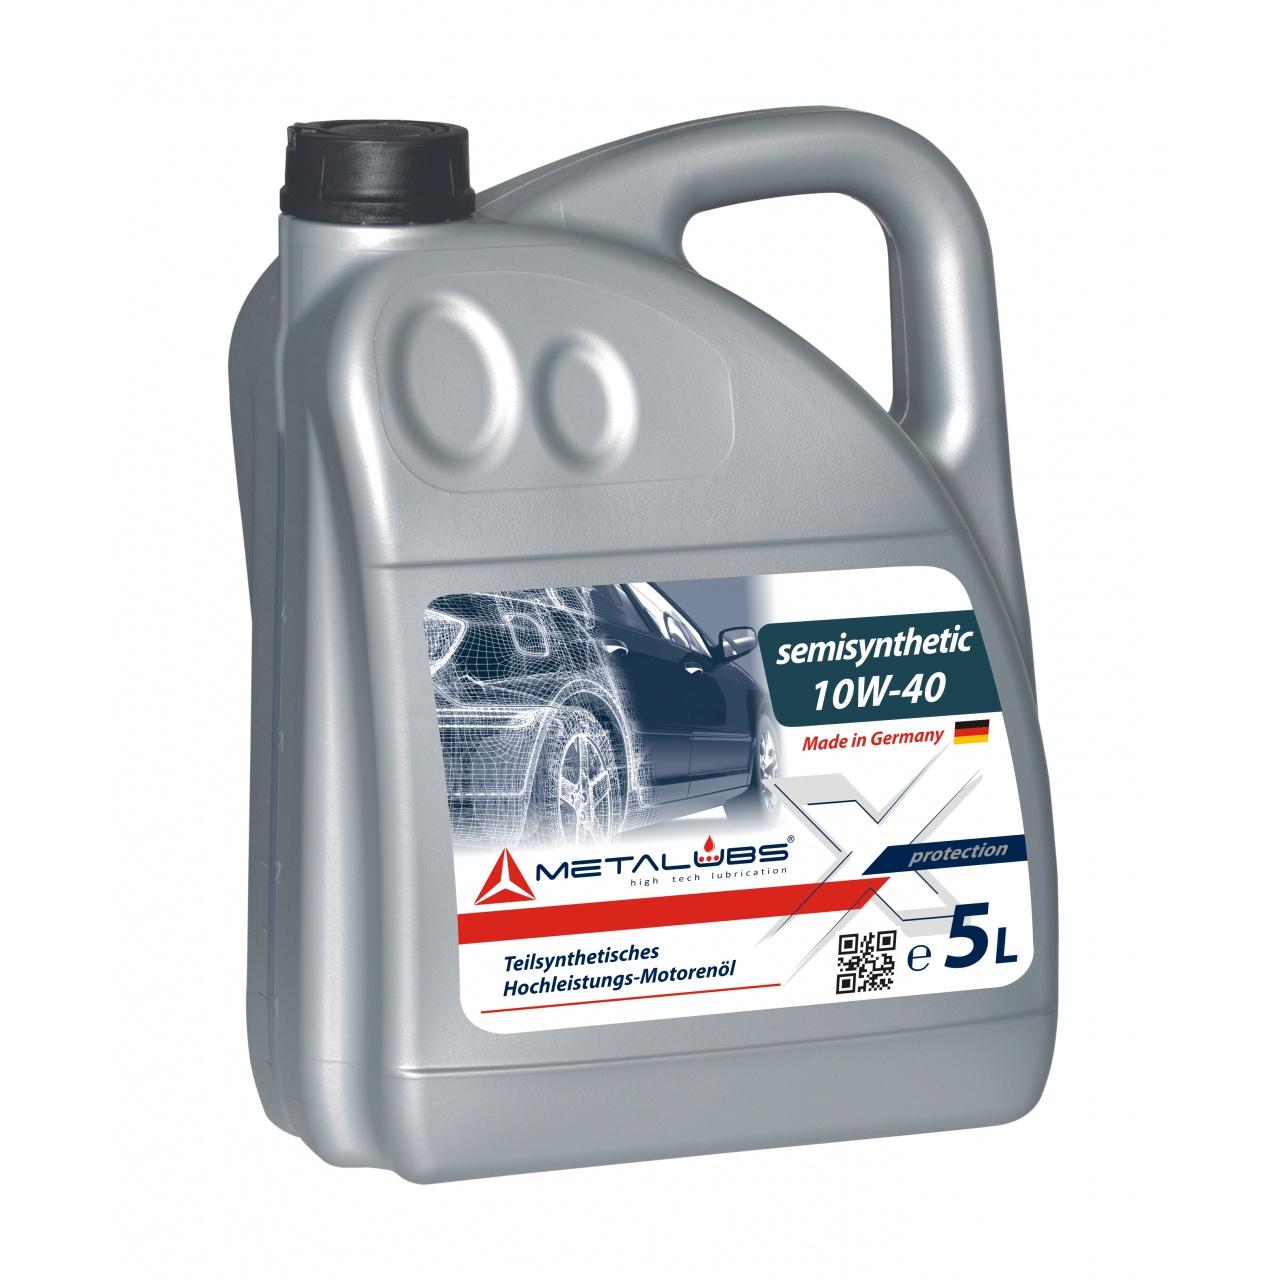 Metalubs Semi-Synthetic Oil 10W-40 5l